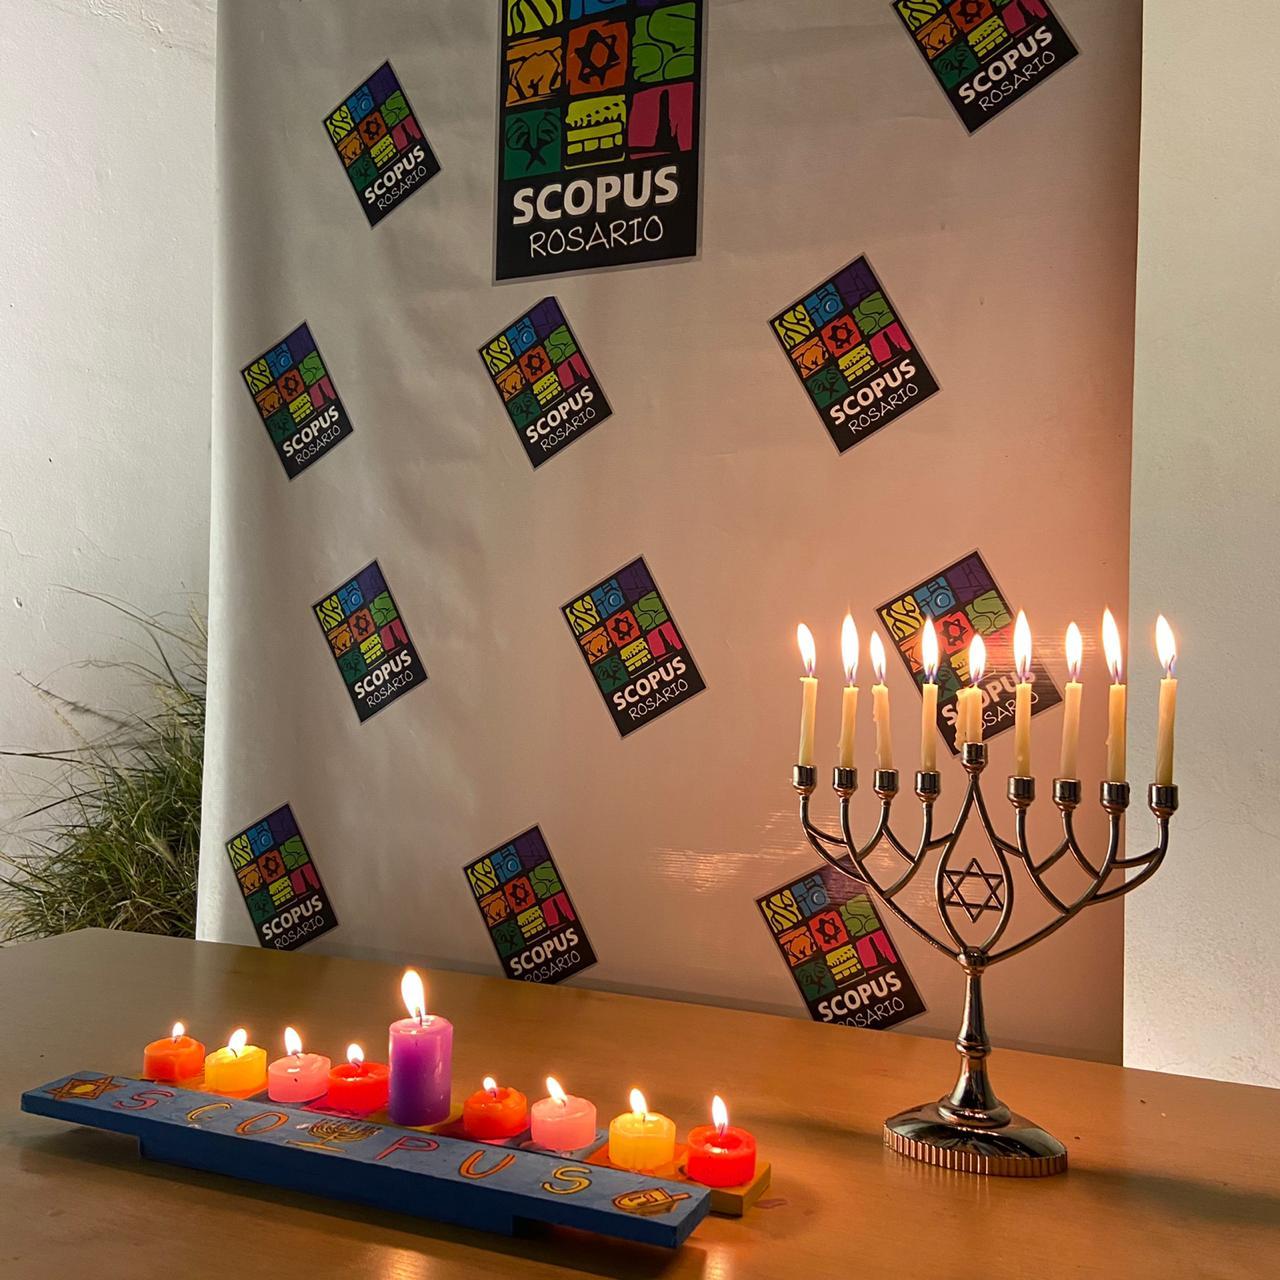 Encendido de la 8° vela de Januca en Beit Scopus